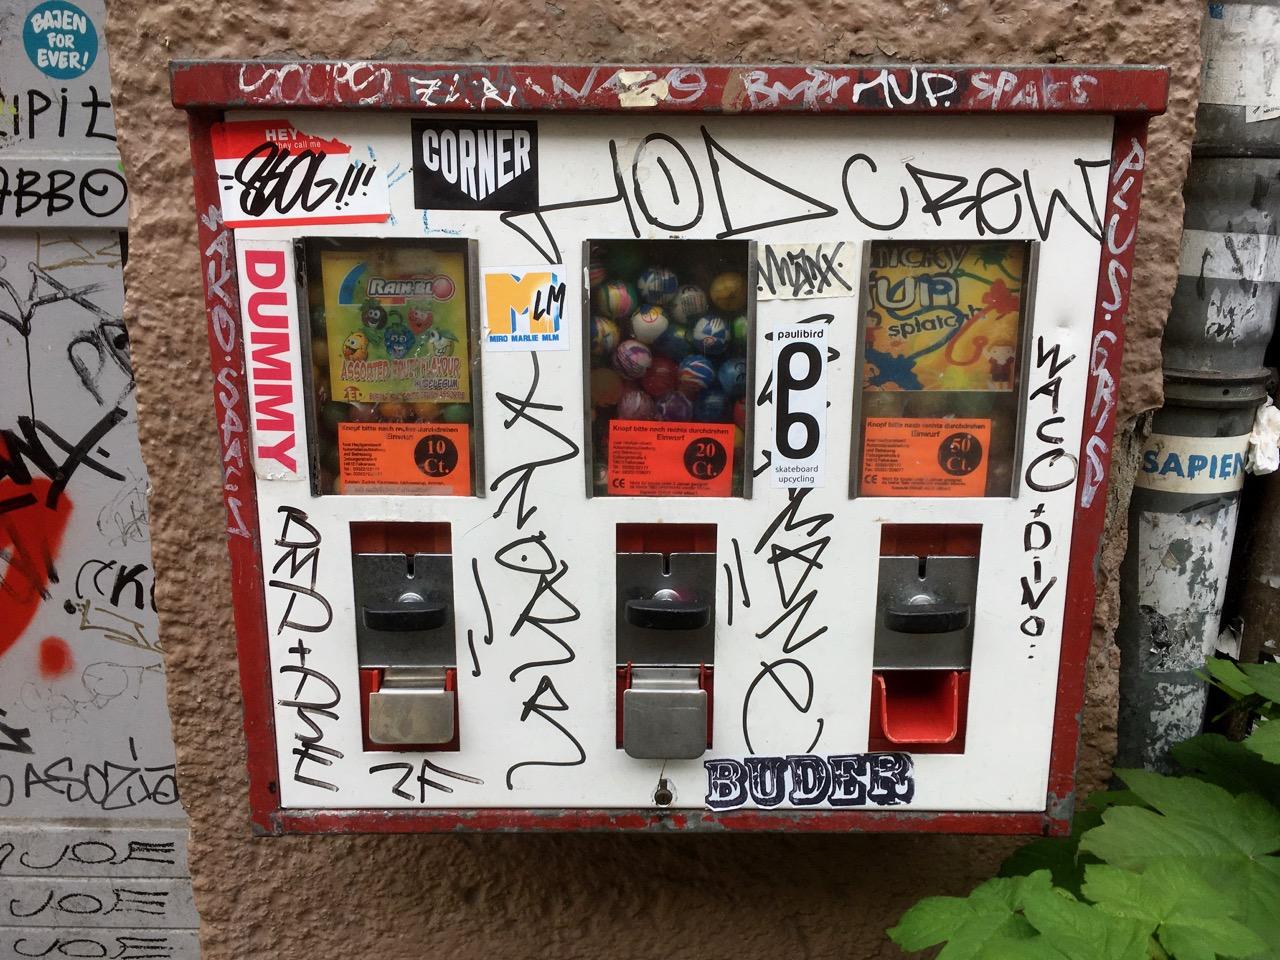 Kaugummiautomaten / ベルリンのチューインガム自販機